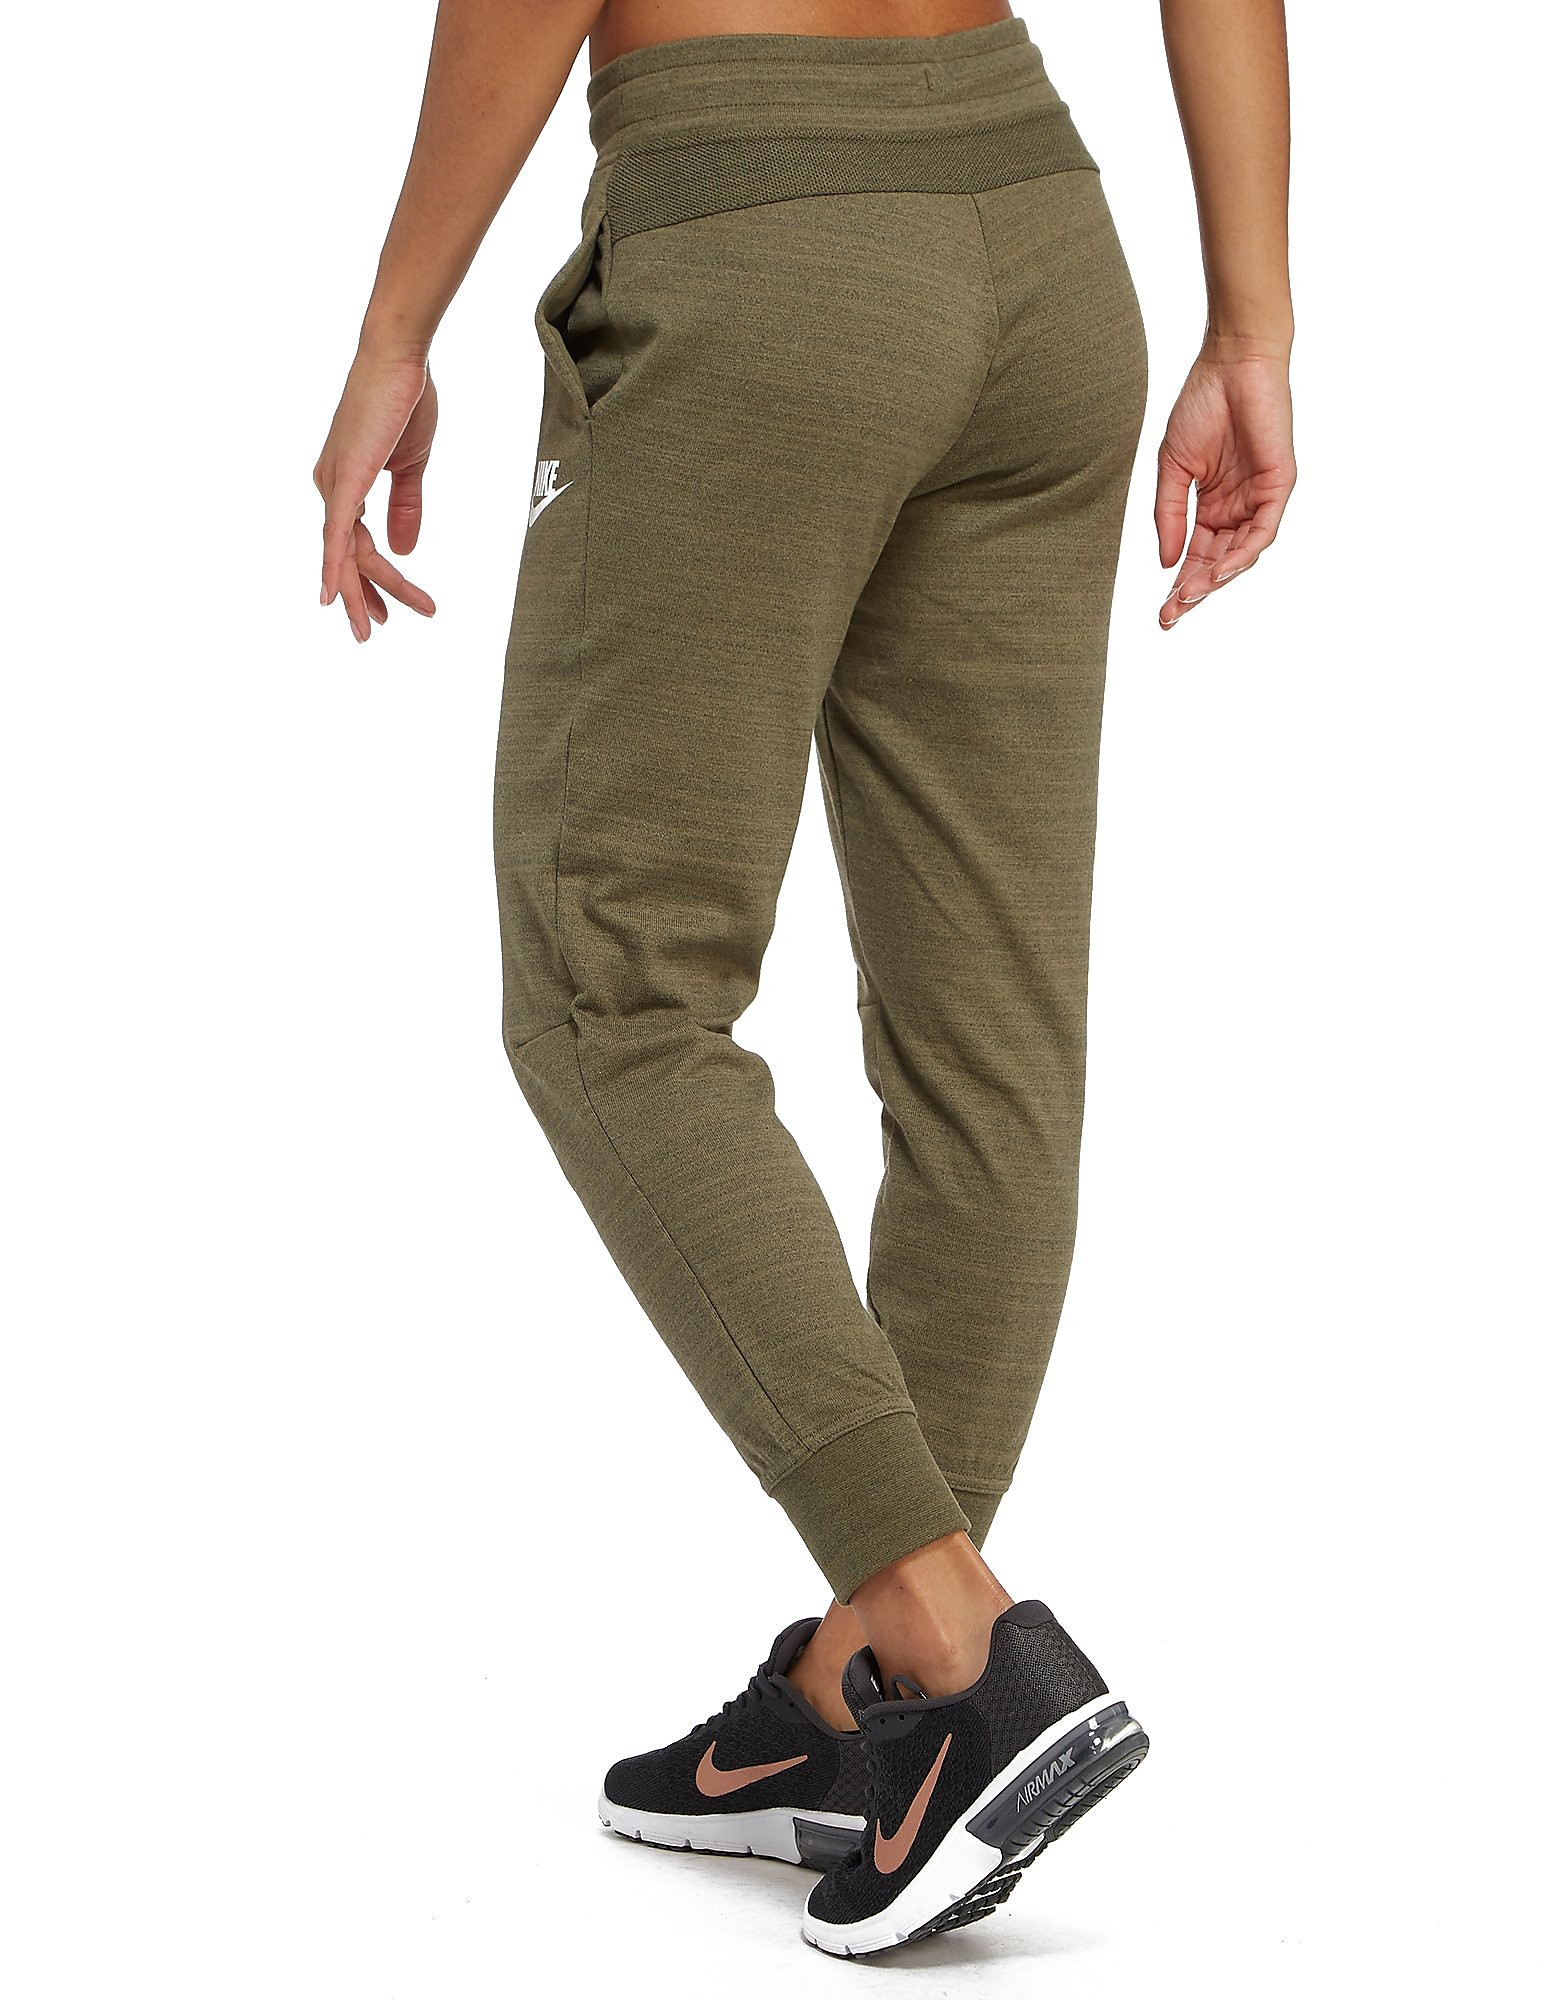 Nike Advance 15 Fleece Pants